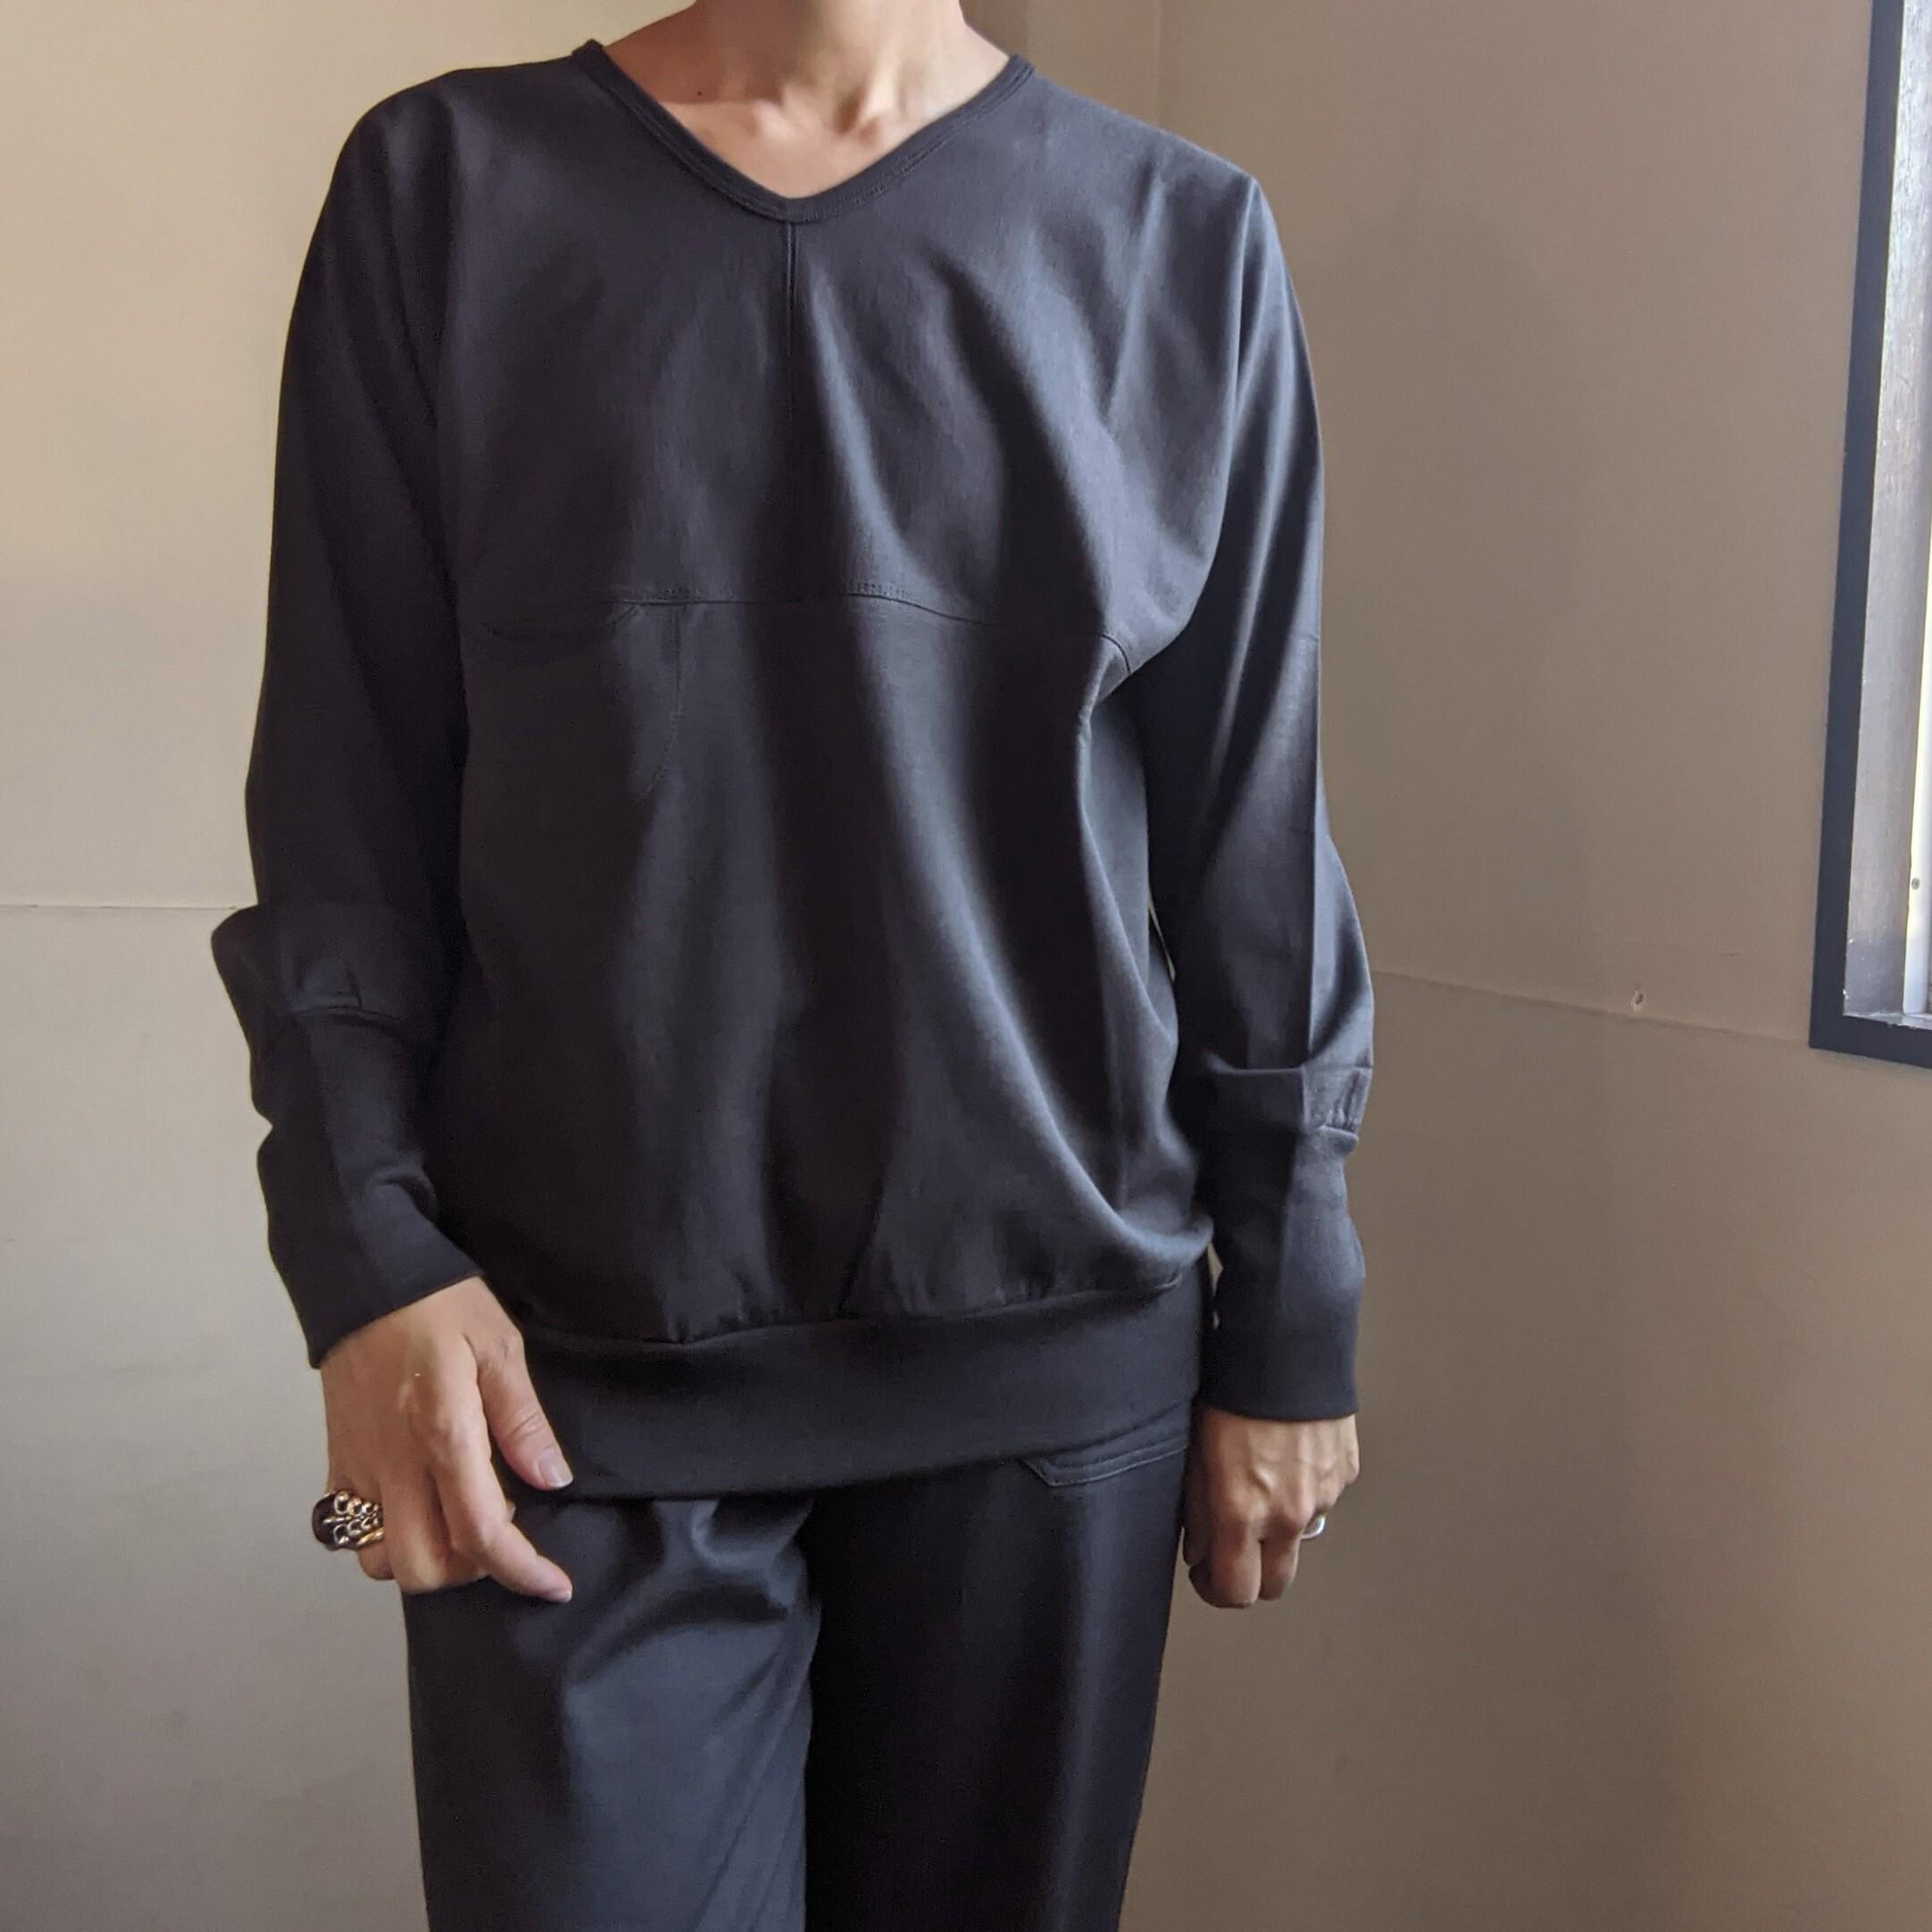 【 CLOSELY CLICK PEBBLE 】Vネックドルマンスリーブプルオーバー / cotton wool / chacoal チャコール /V-neck dolman sleeve pullover